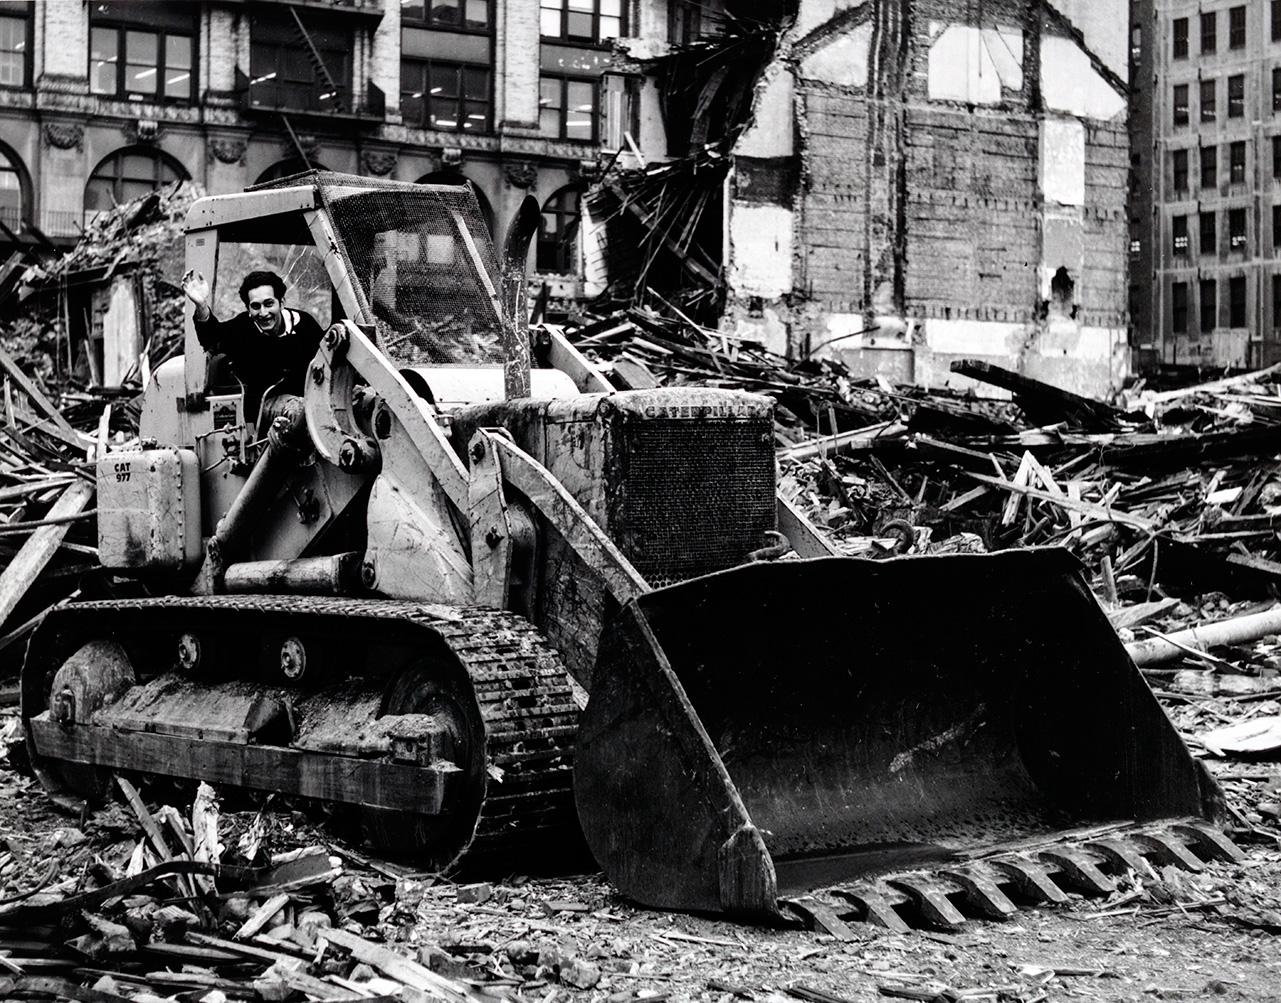 Frampton_24_507-bulldozer_1281